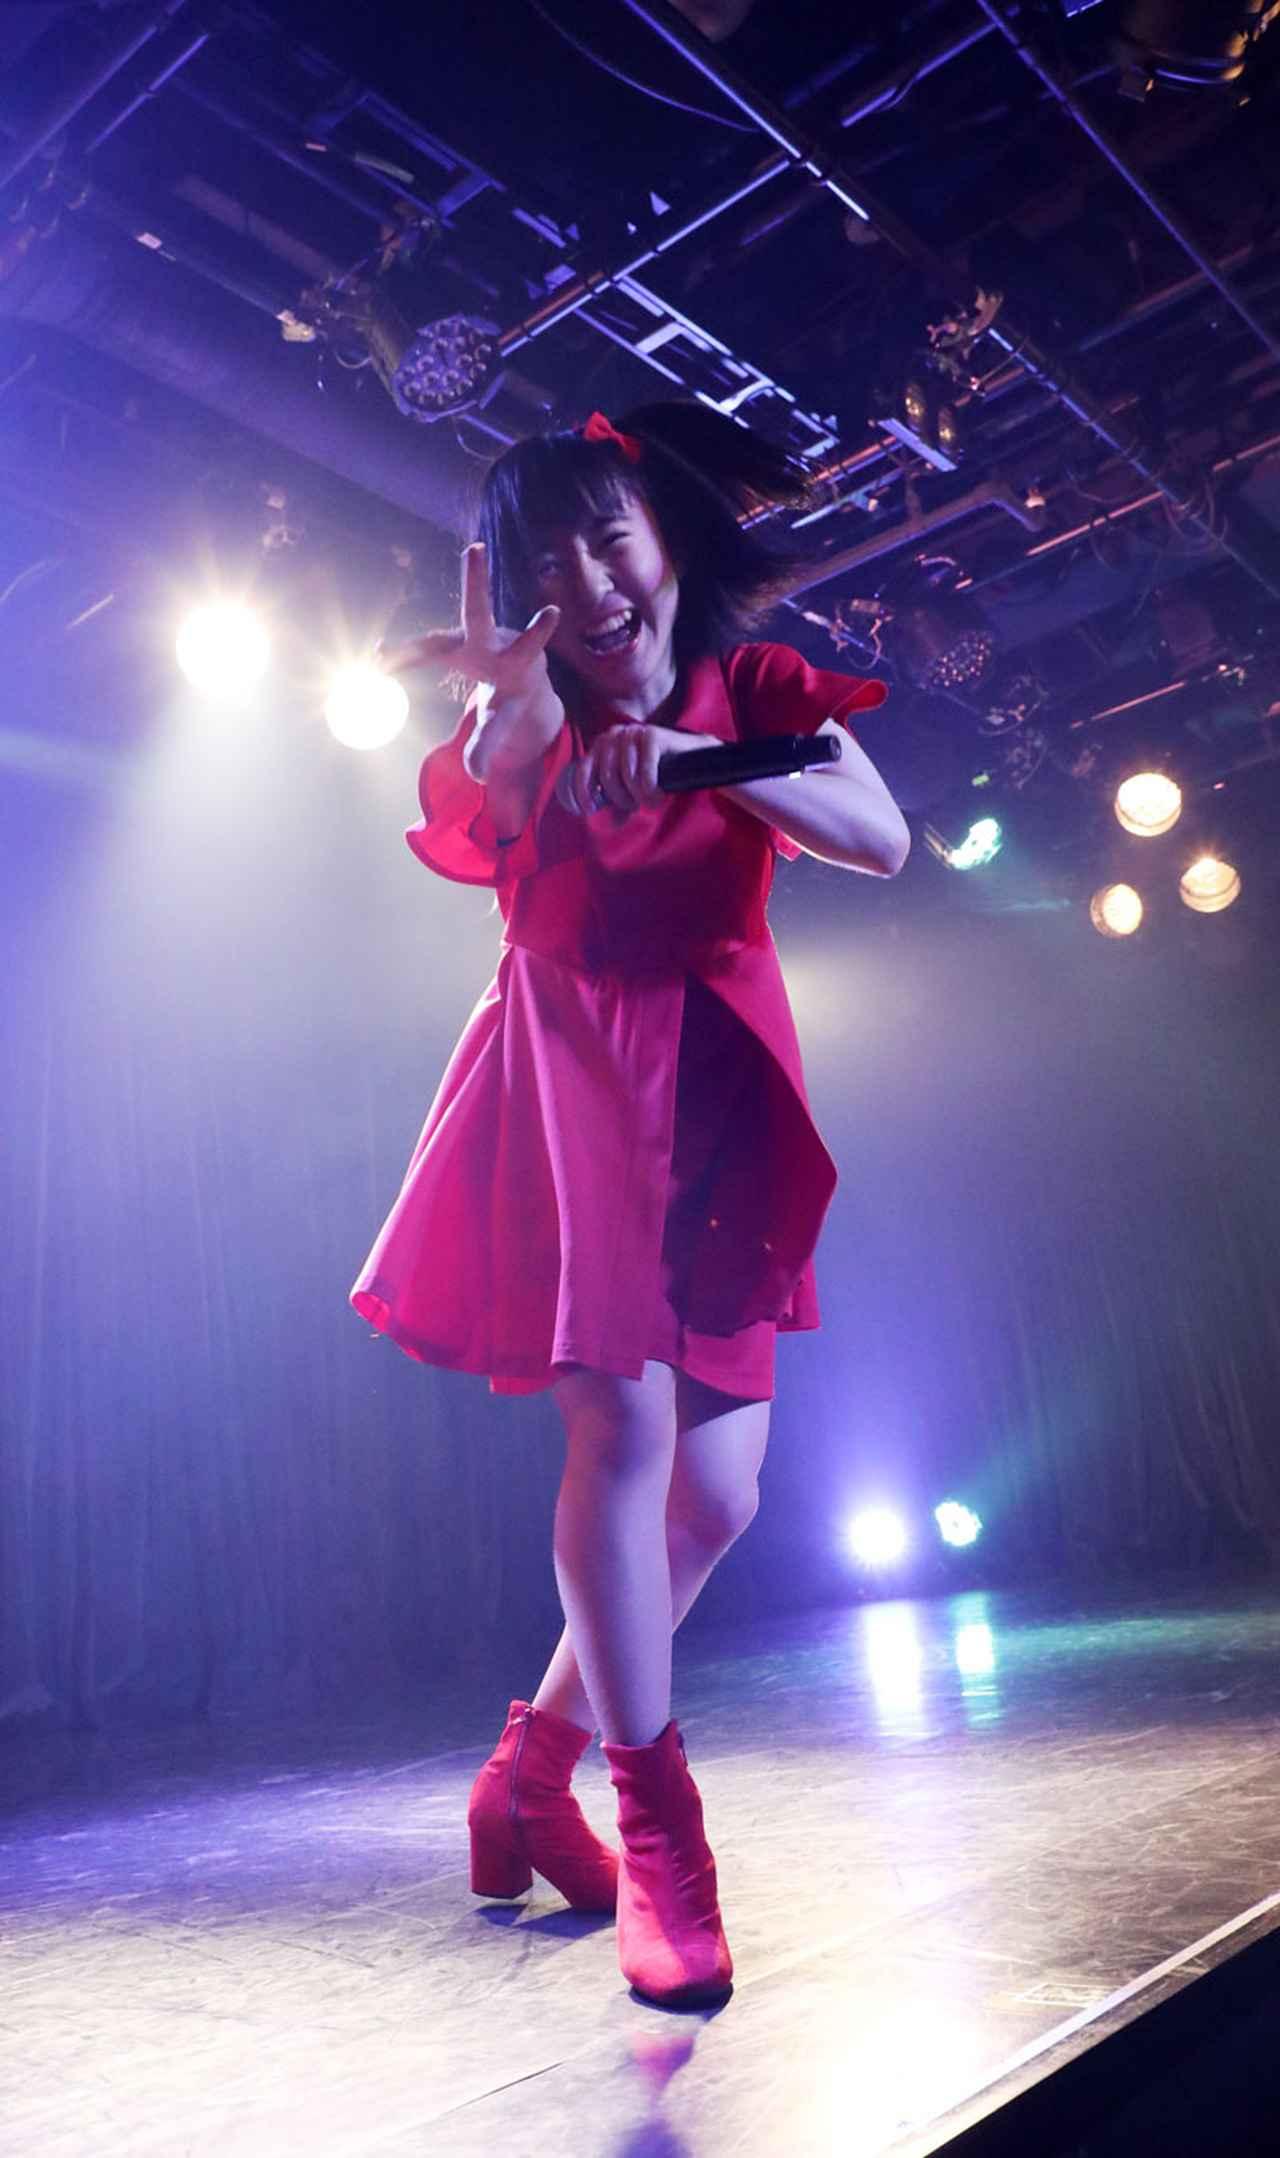 Images : 31番目の画像 - 「九州女子翼/定期公演第十四片inTOKYOは、いままでの成長を一気に開花させた極上のステージを構築」のアルバム - Stereo Sound ONLINE